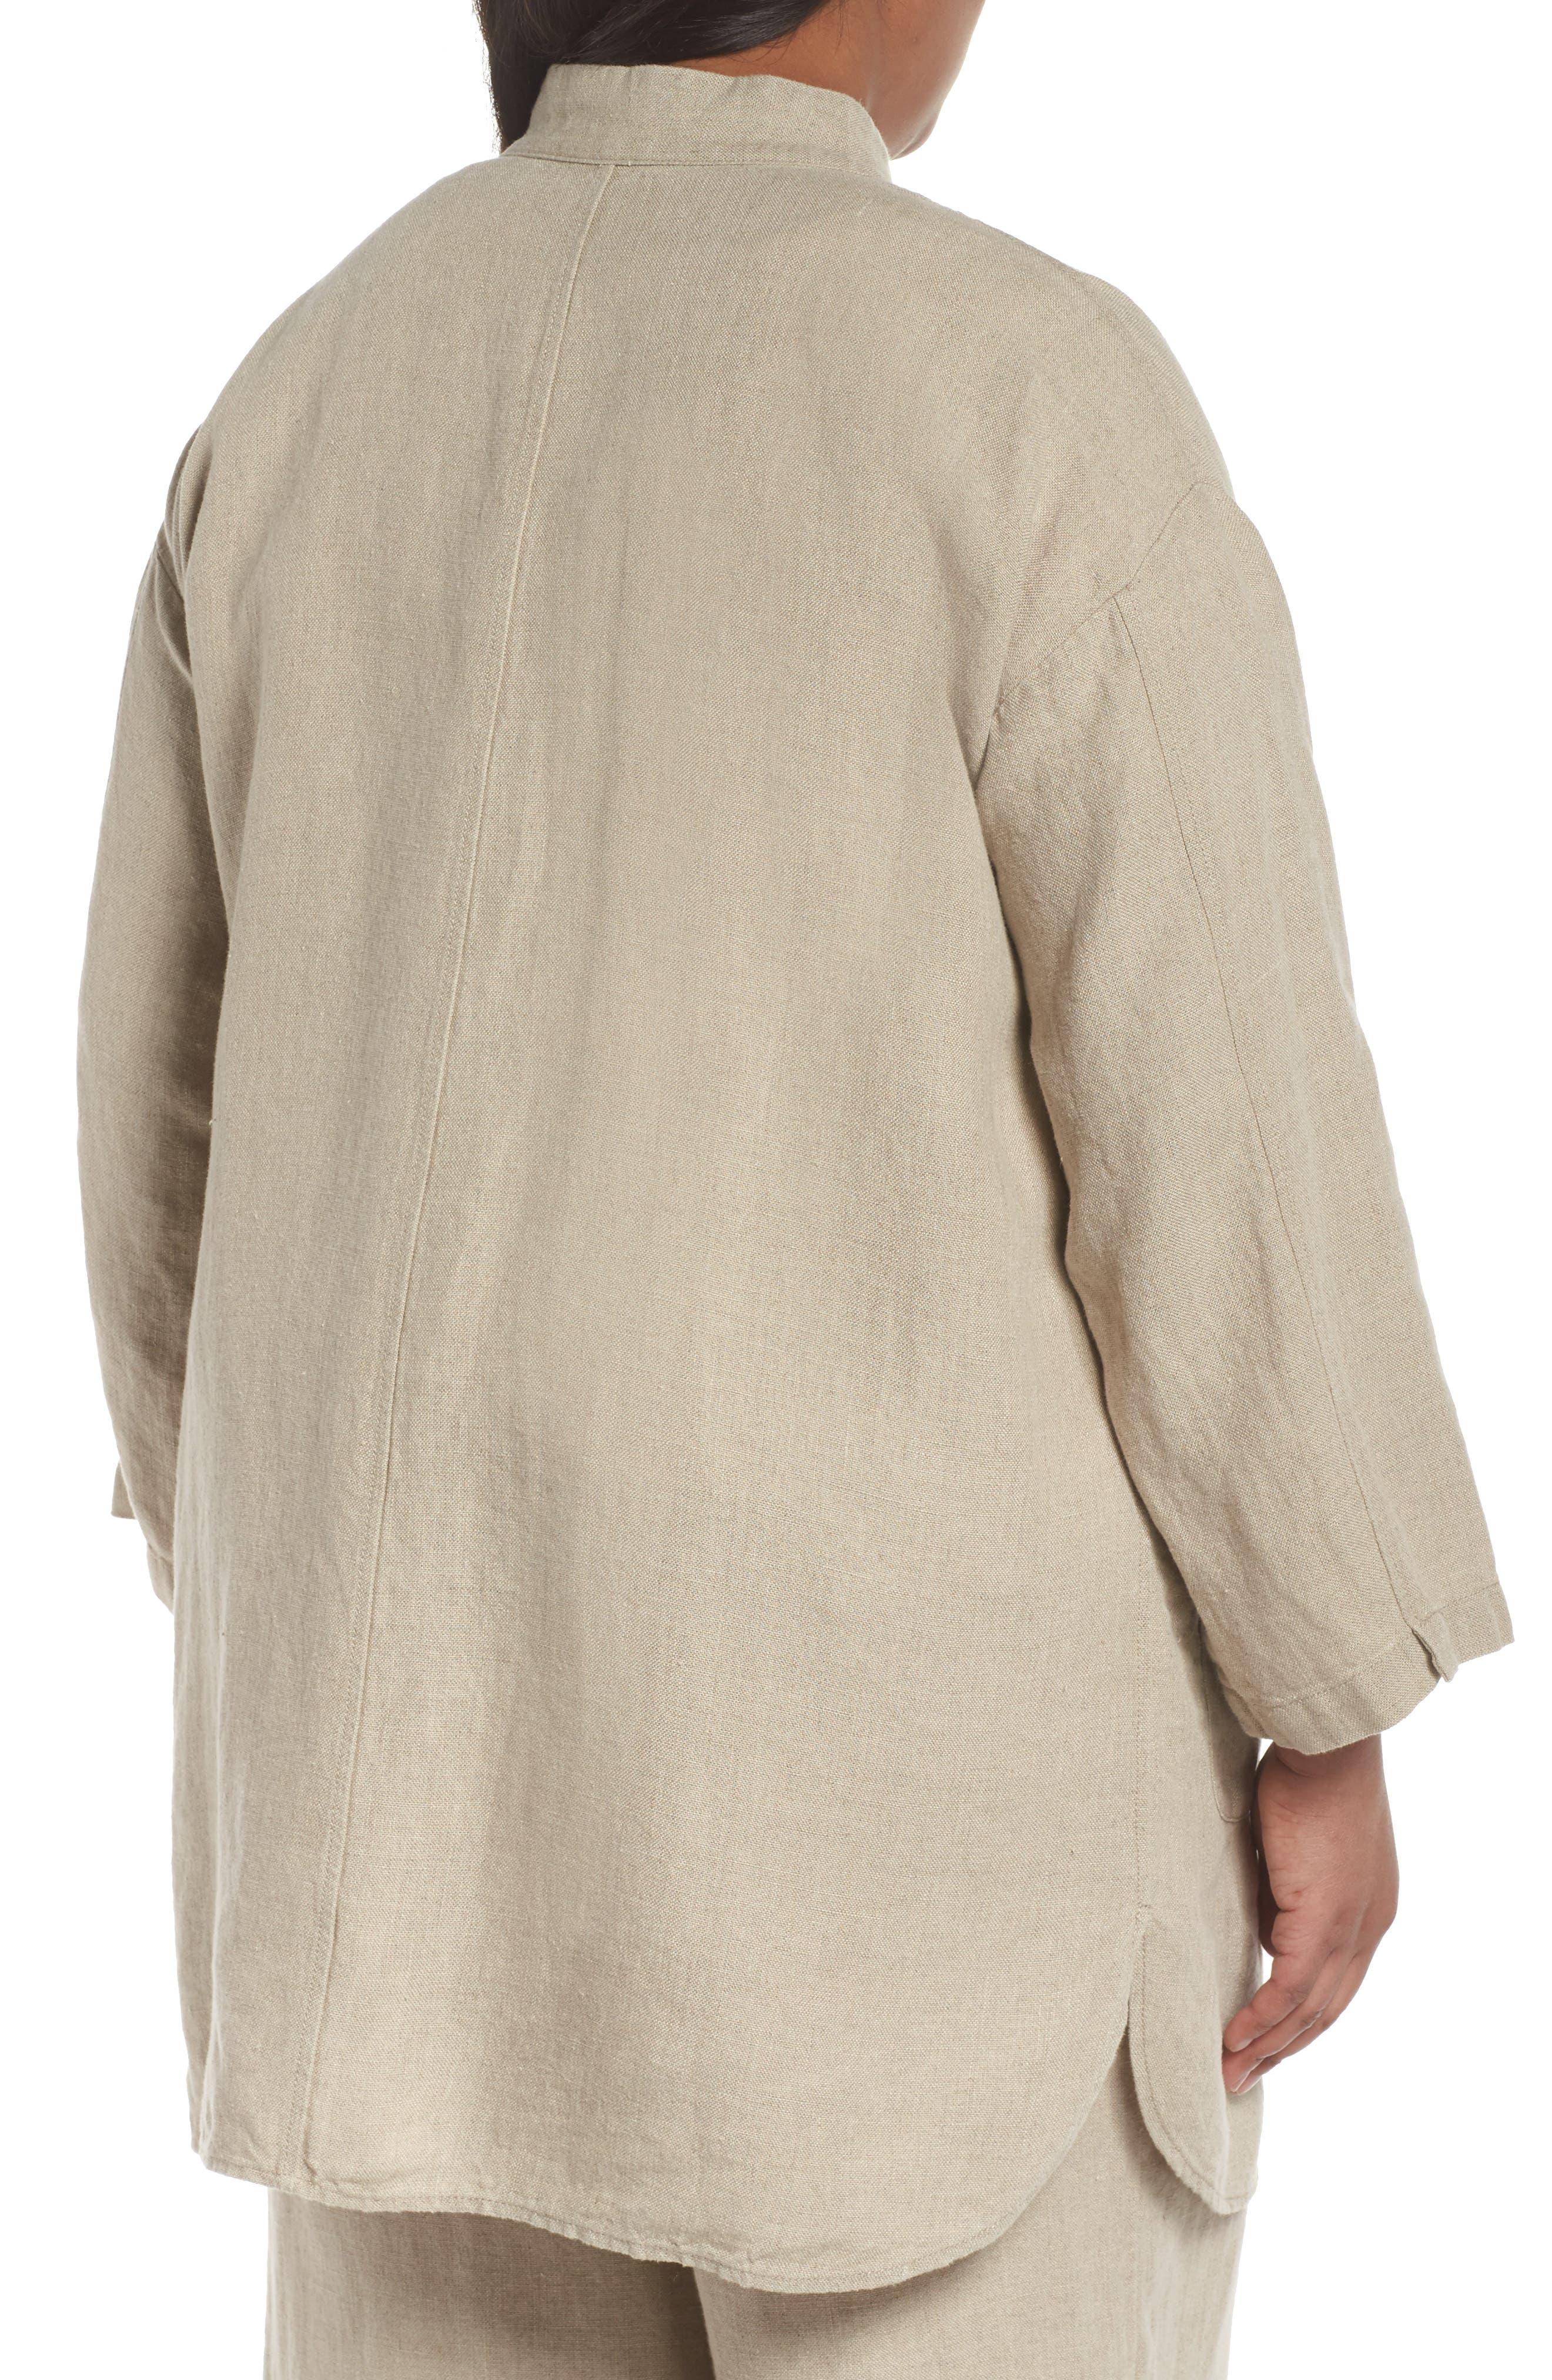 Organic Linen Jacket,                             Alternate thumbnail 2, color,                             251